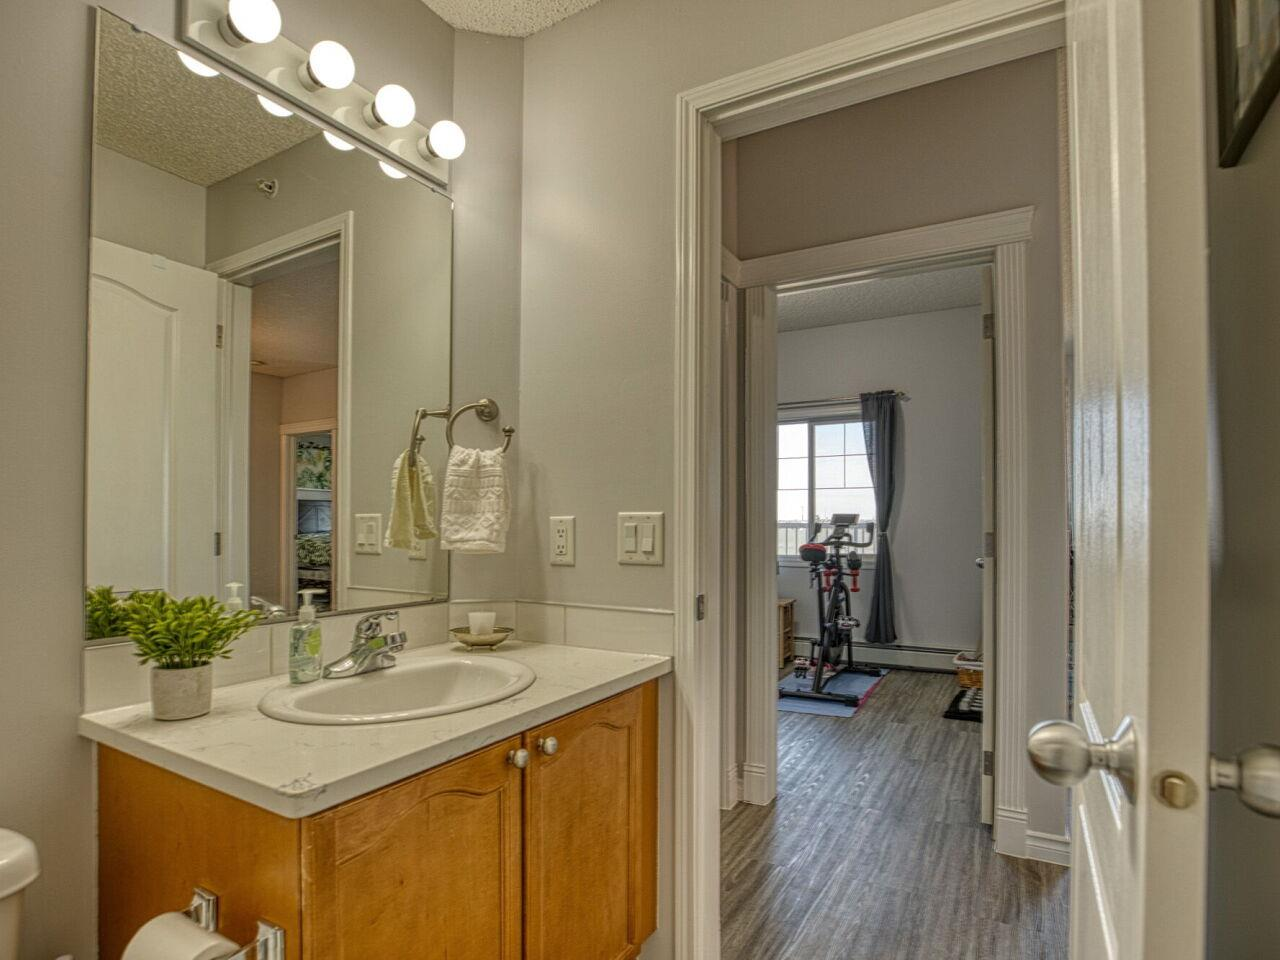 429 16807 100 Avenue - Glenwood_EDMO Lowrise Apartment for sale, 2 Bedrooms (E4234341) #22